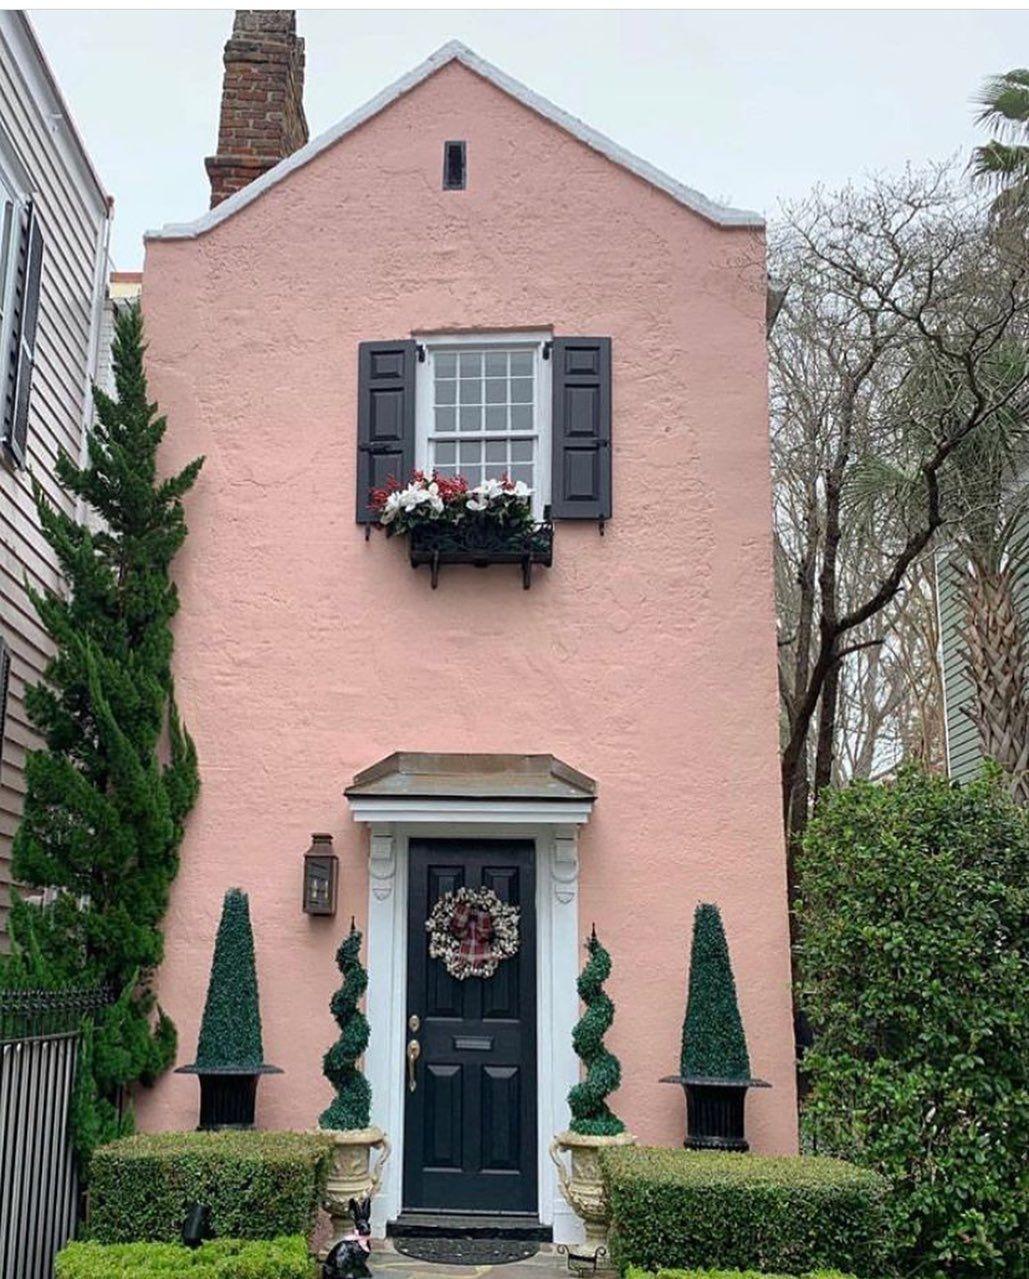 "Island Haus Co. on Instagram: ""Charleston, you're cute. . . #fridayfeels #charleston #charlestonhomes #inspiration #chasingadream #islandhaus #onislandtime #southcarolina…"""